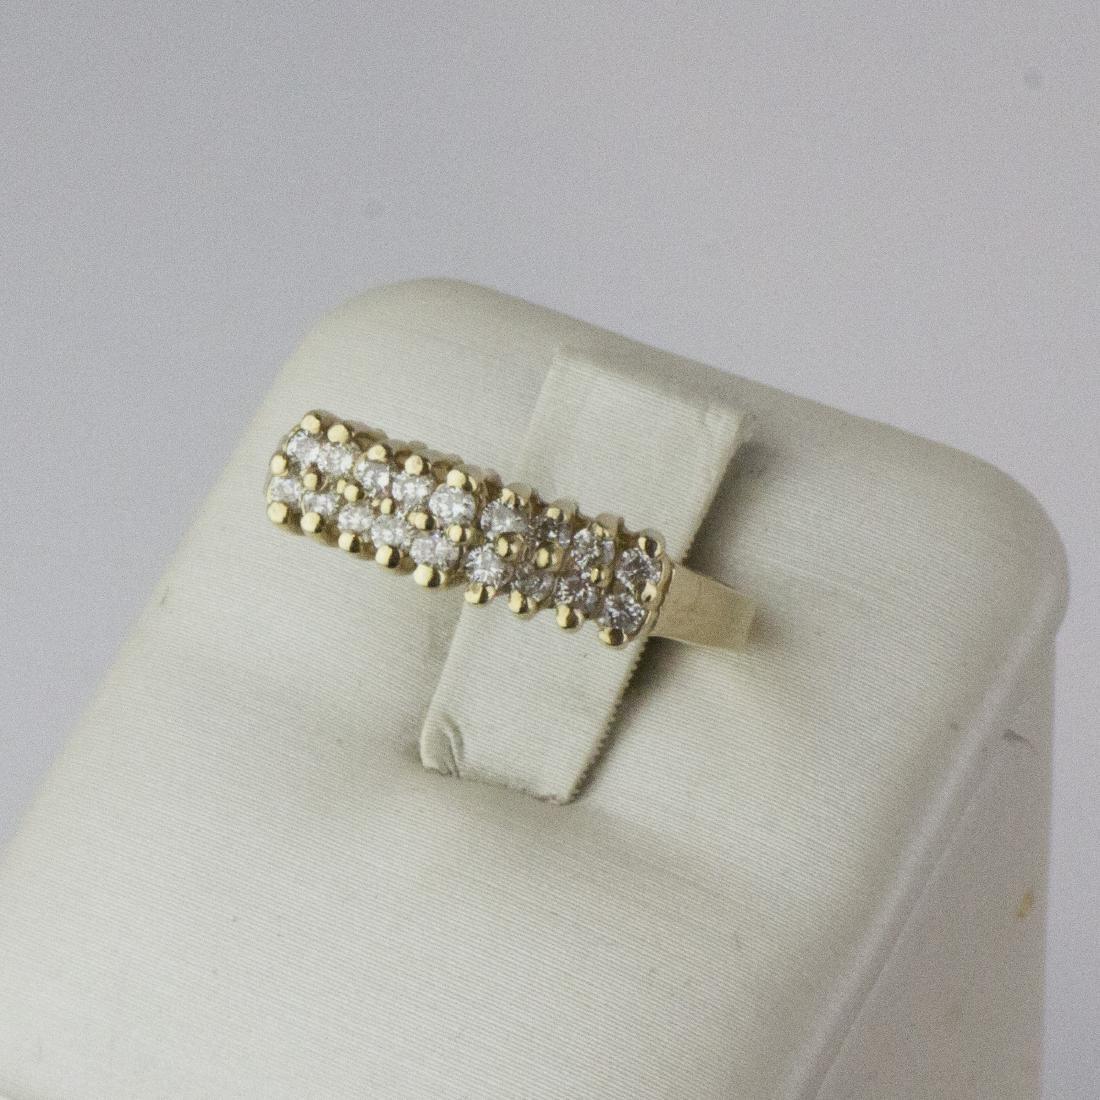 14K Yellow Gold Diamond Pyramid Design Ring - 6